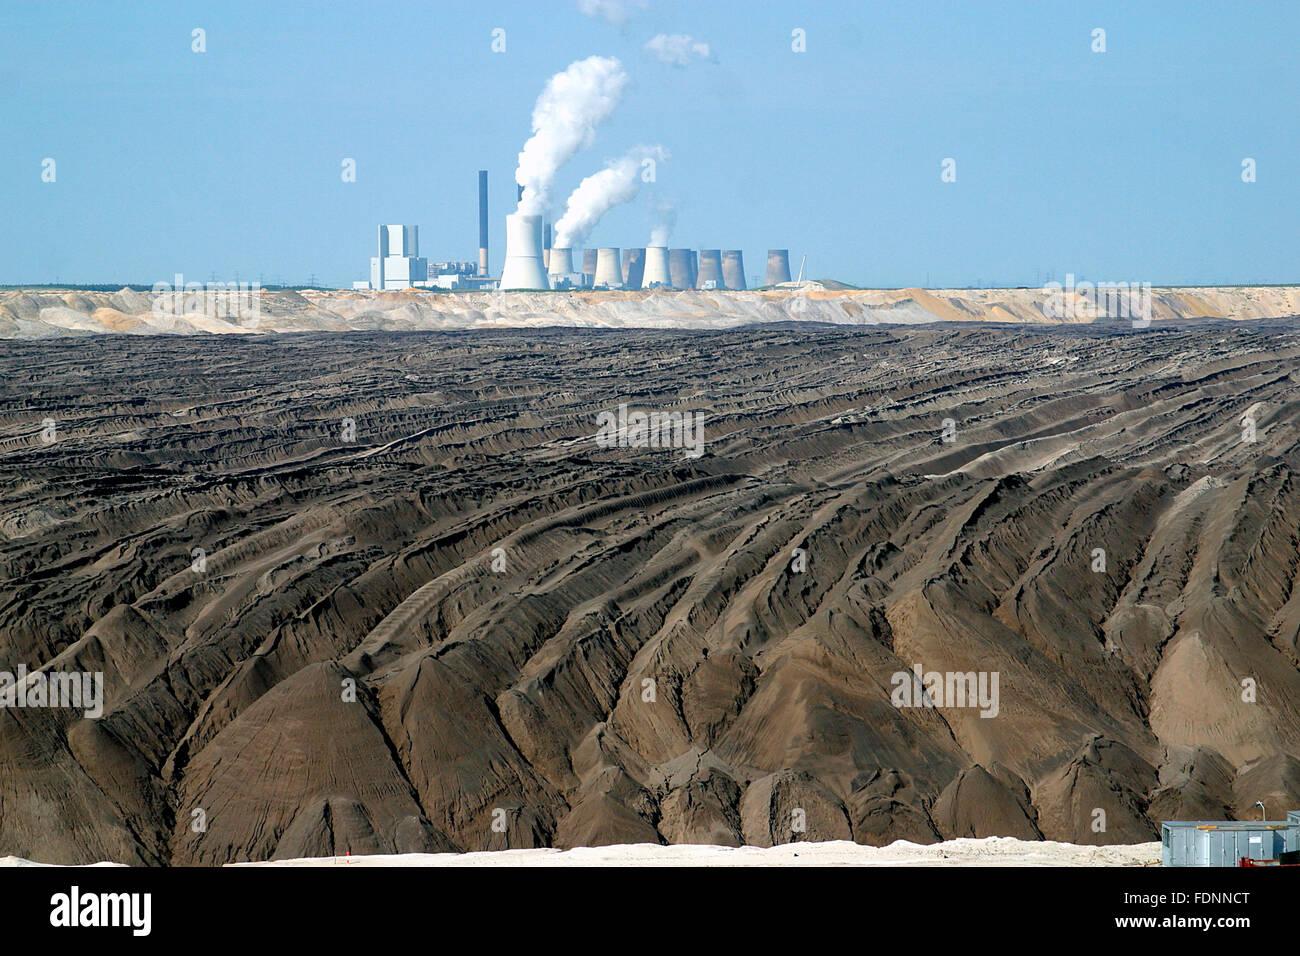 industrial landscape,opencast,power plant,mine dump,mining - Stock Image